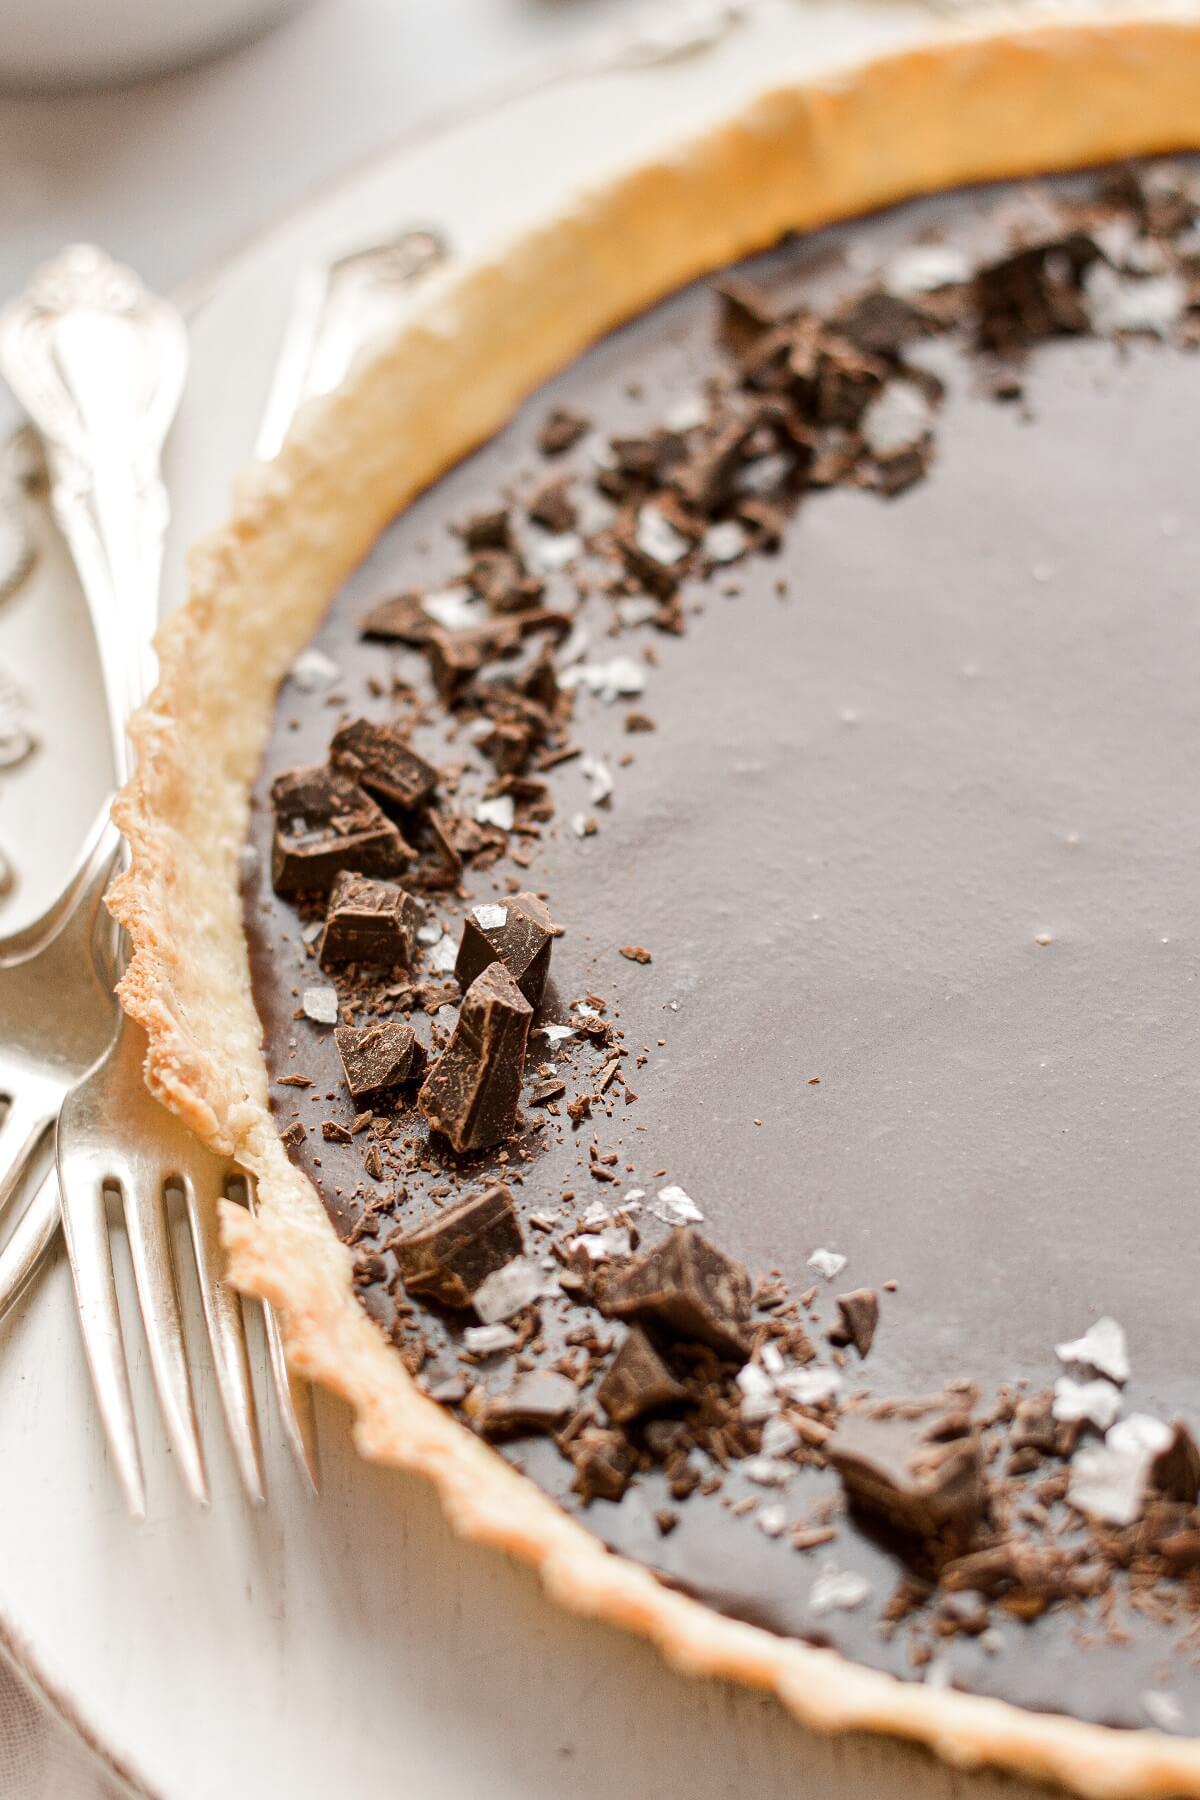 A chocolate caramel tart, sprinkled with chopped chocolate and flaky sea salt.